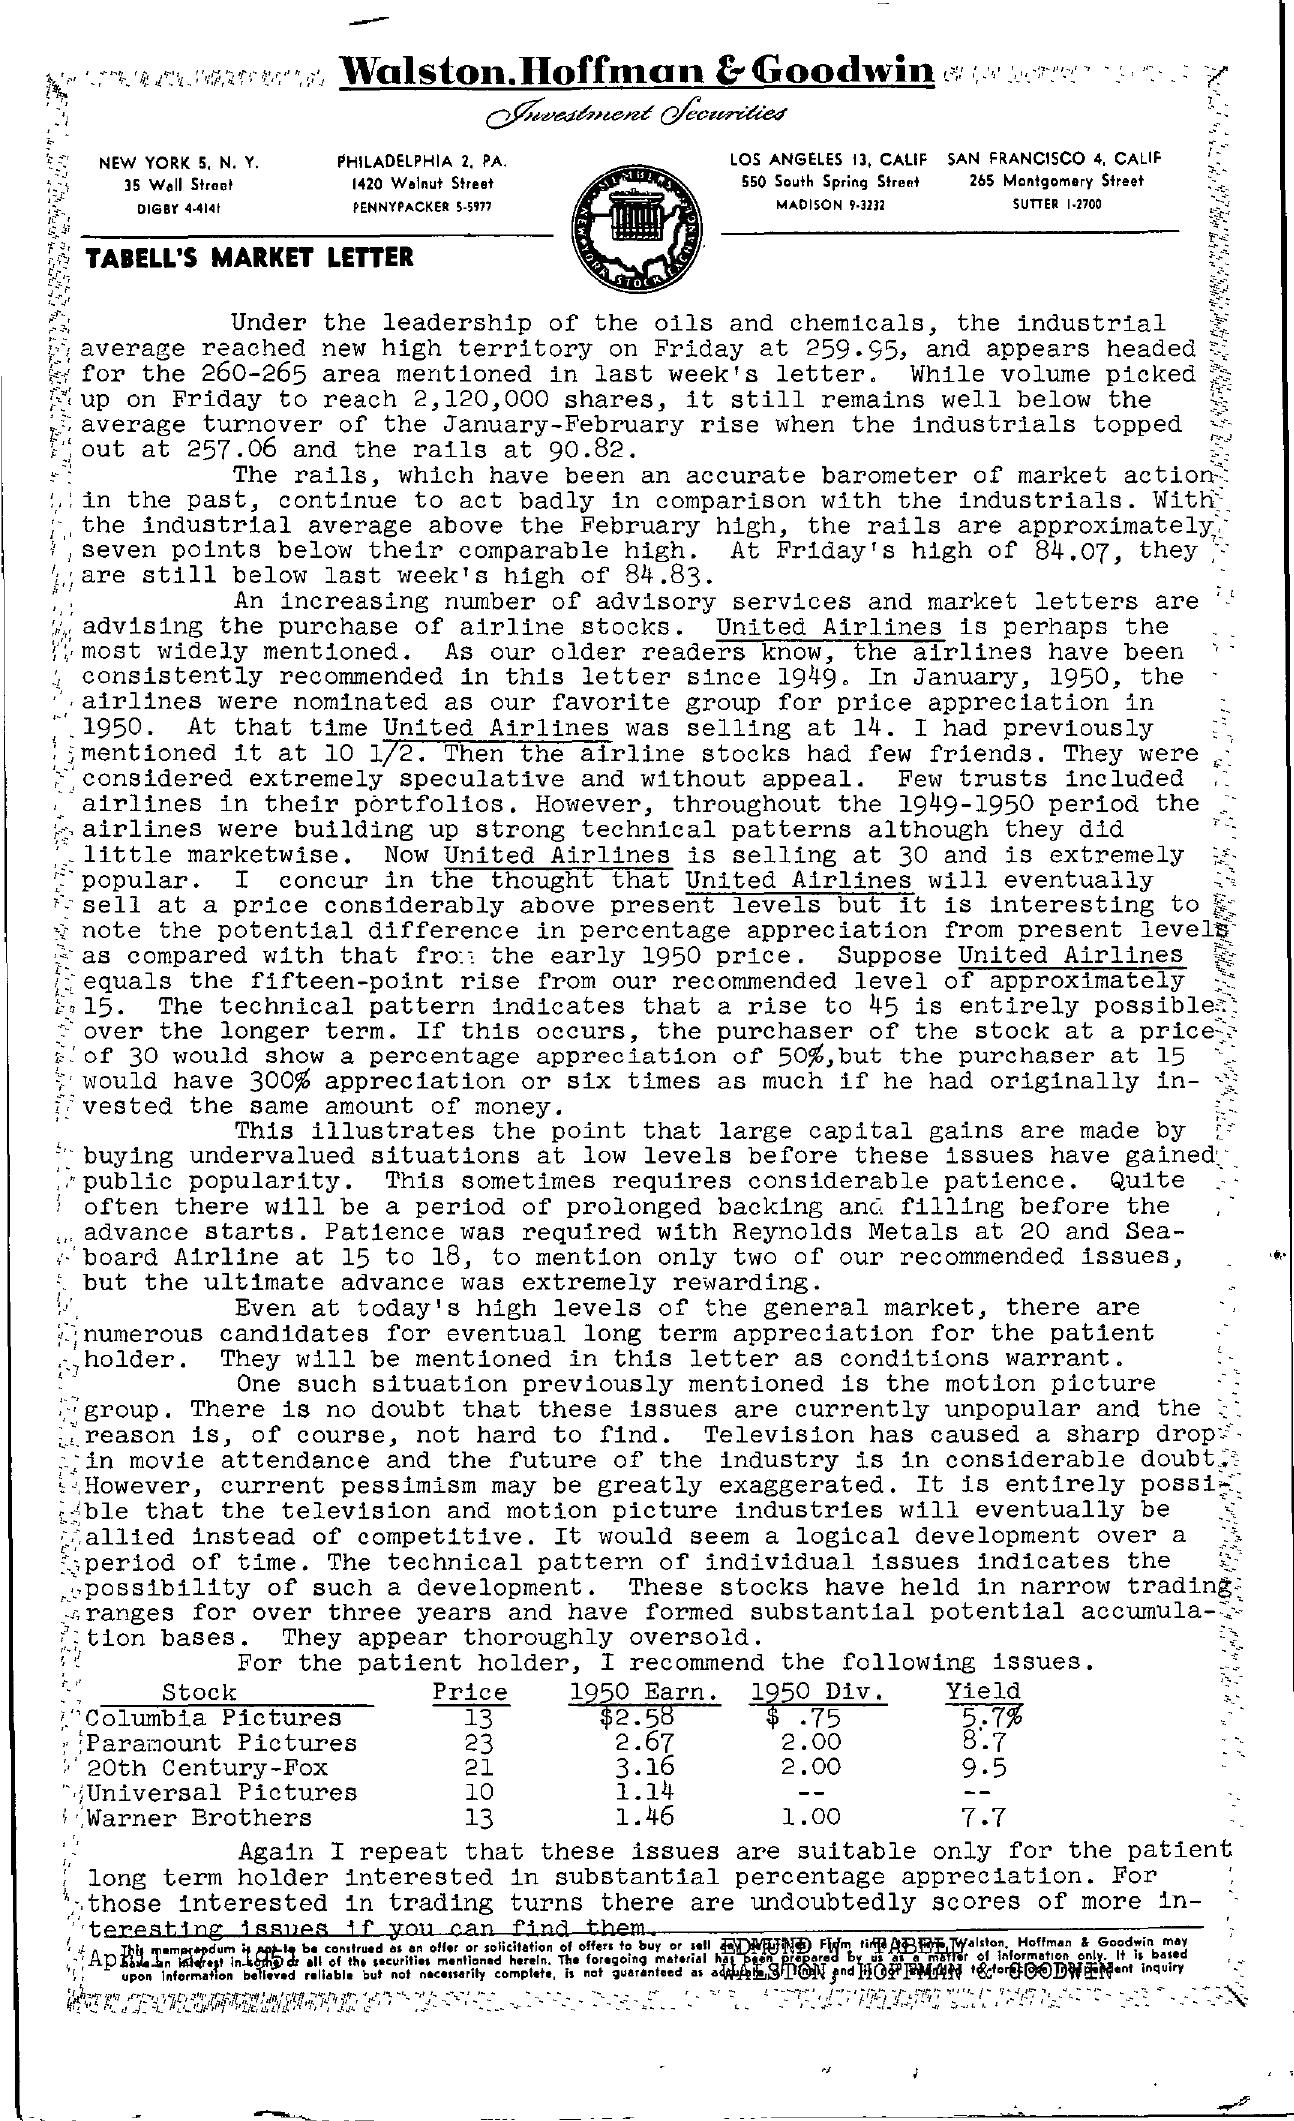 Tabell's Market Letter - April 27, 1951